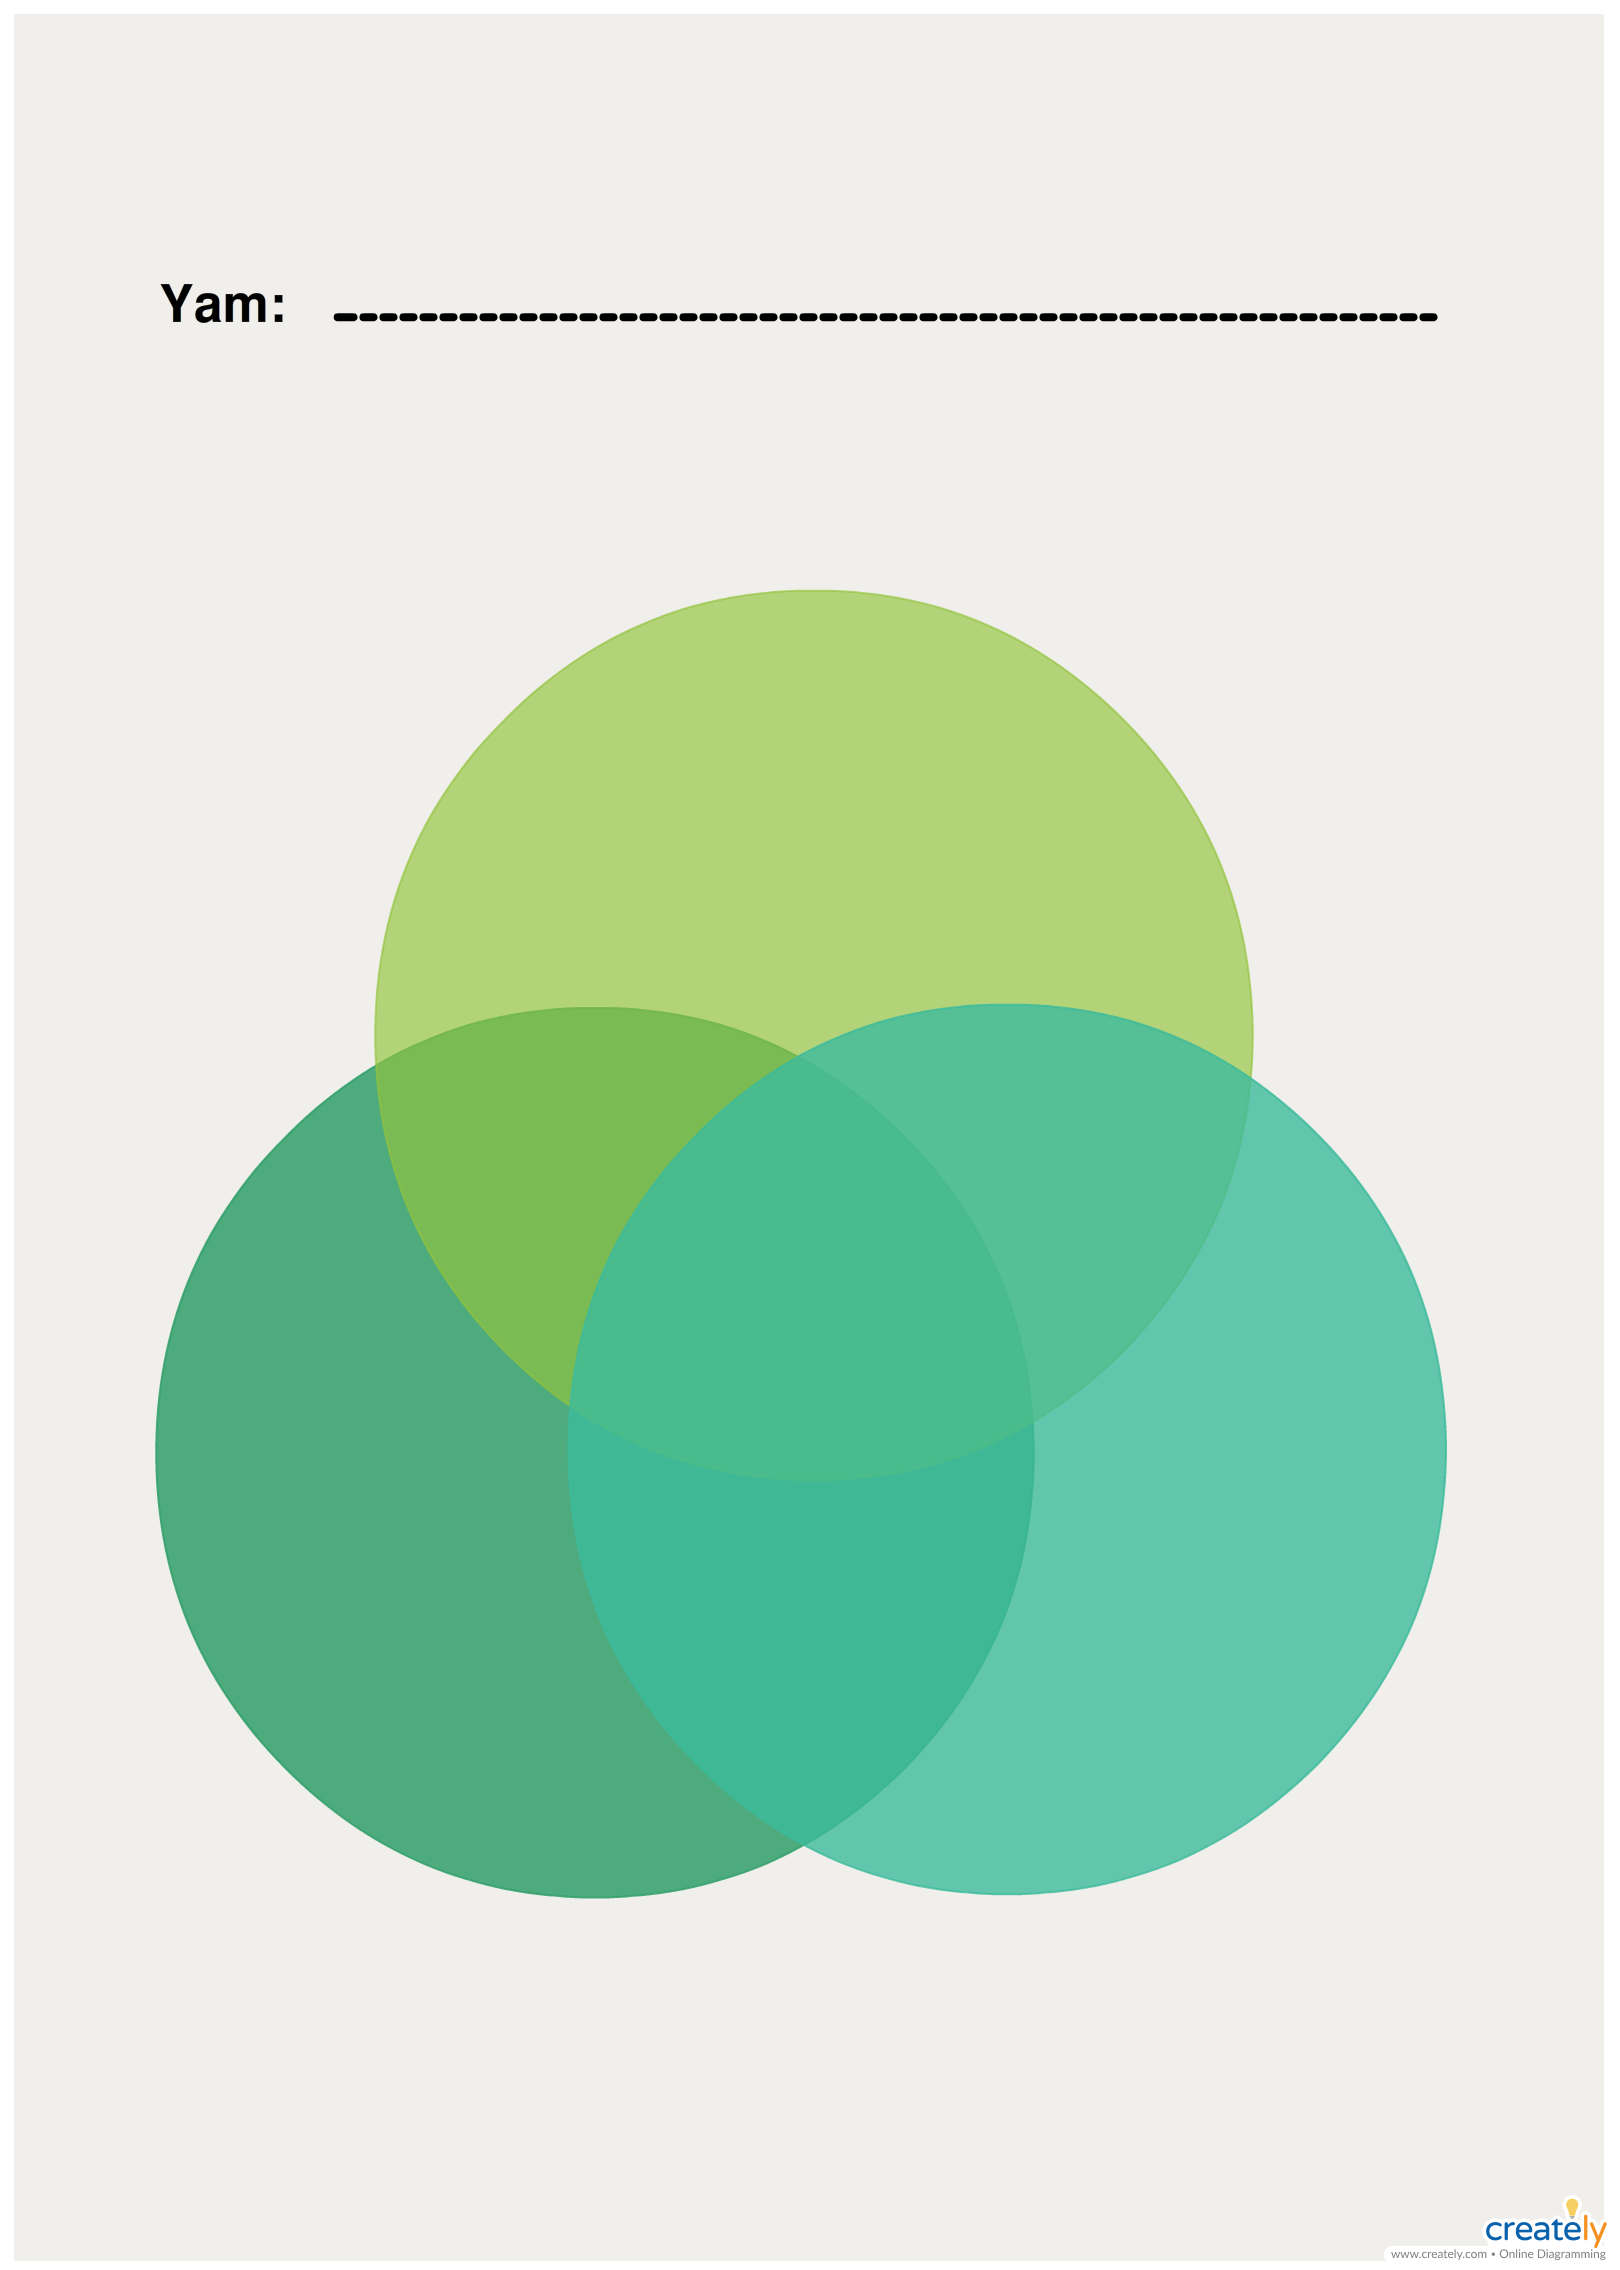 medium resolution of blank 3 set de diagrama venn listo para imprimir para hoja a4 puedes editar esta